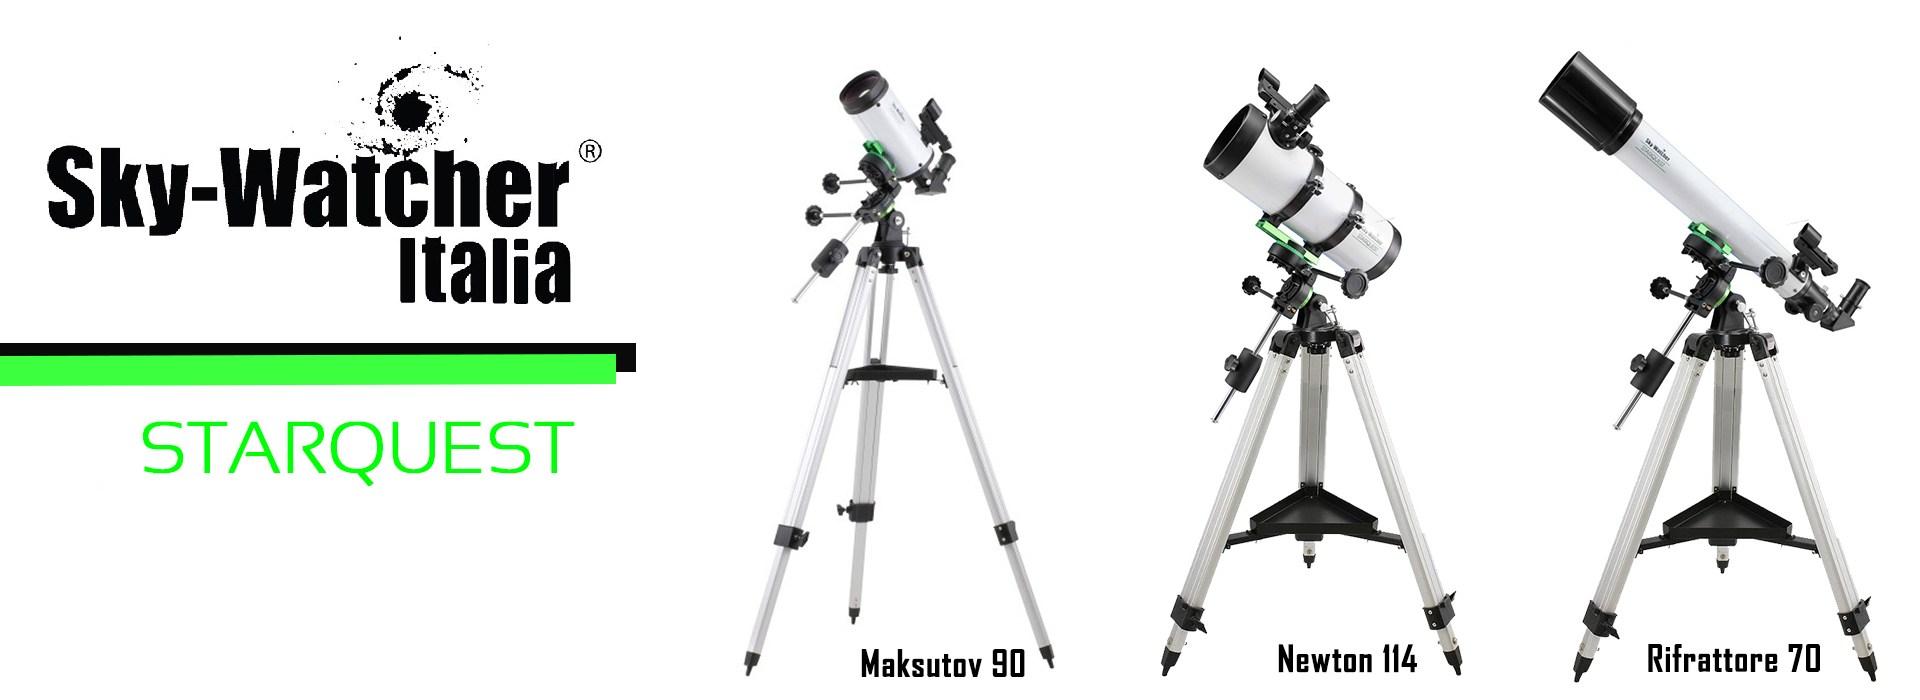 Telescopio Newton 114/500 su montatura equatoriale Sky-Watcher Star Quest